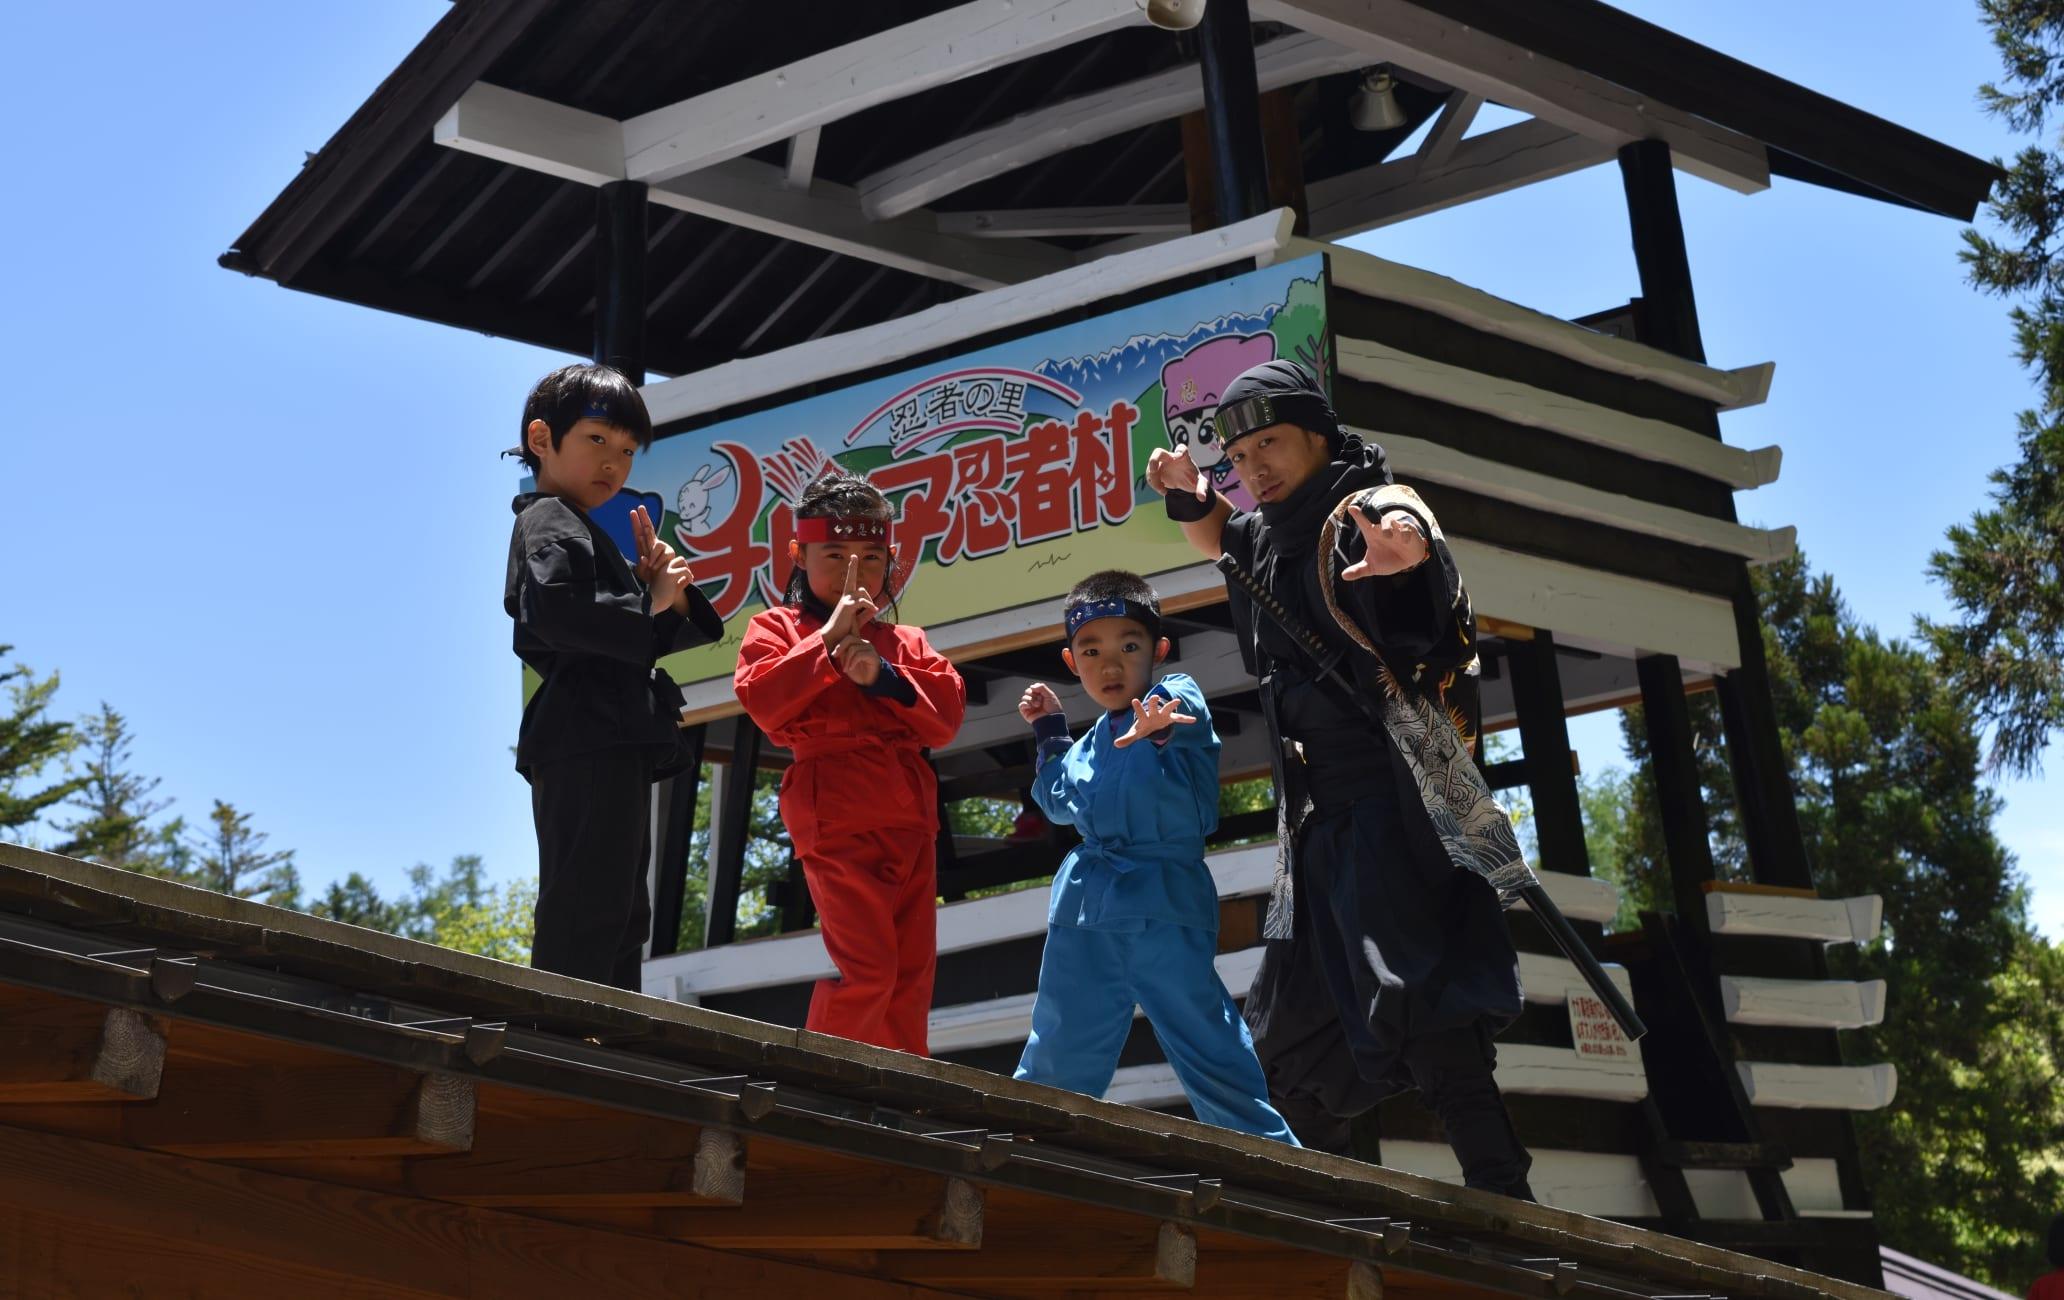 Togakushi Ninja Village